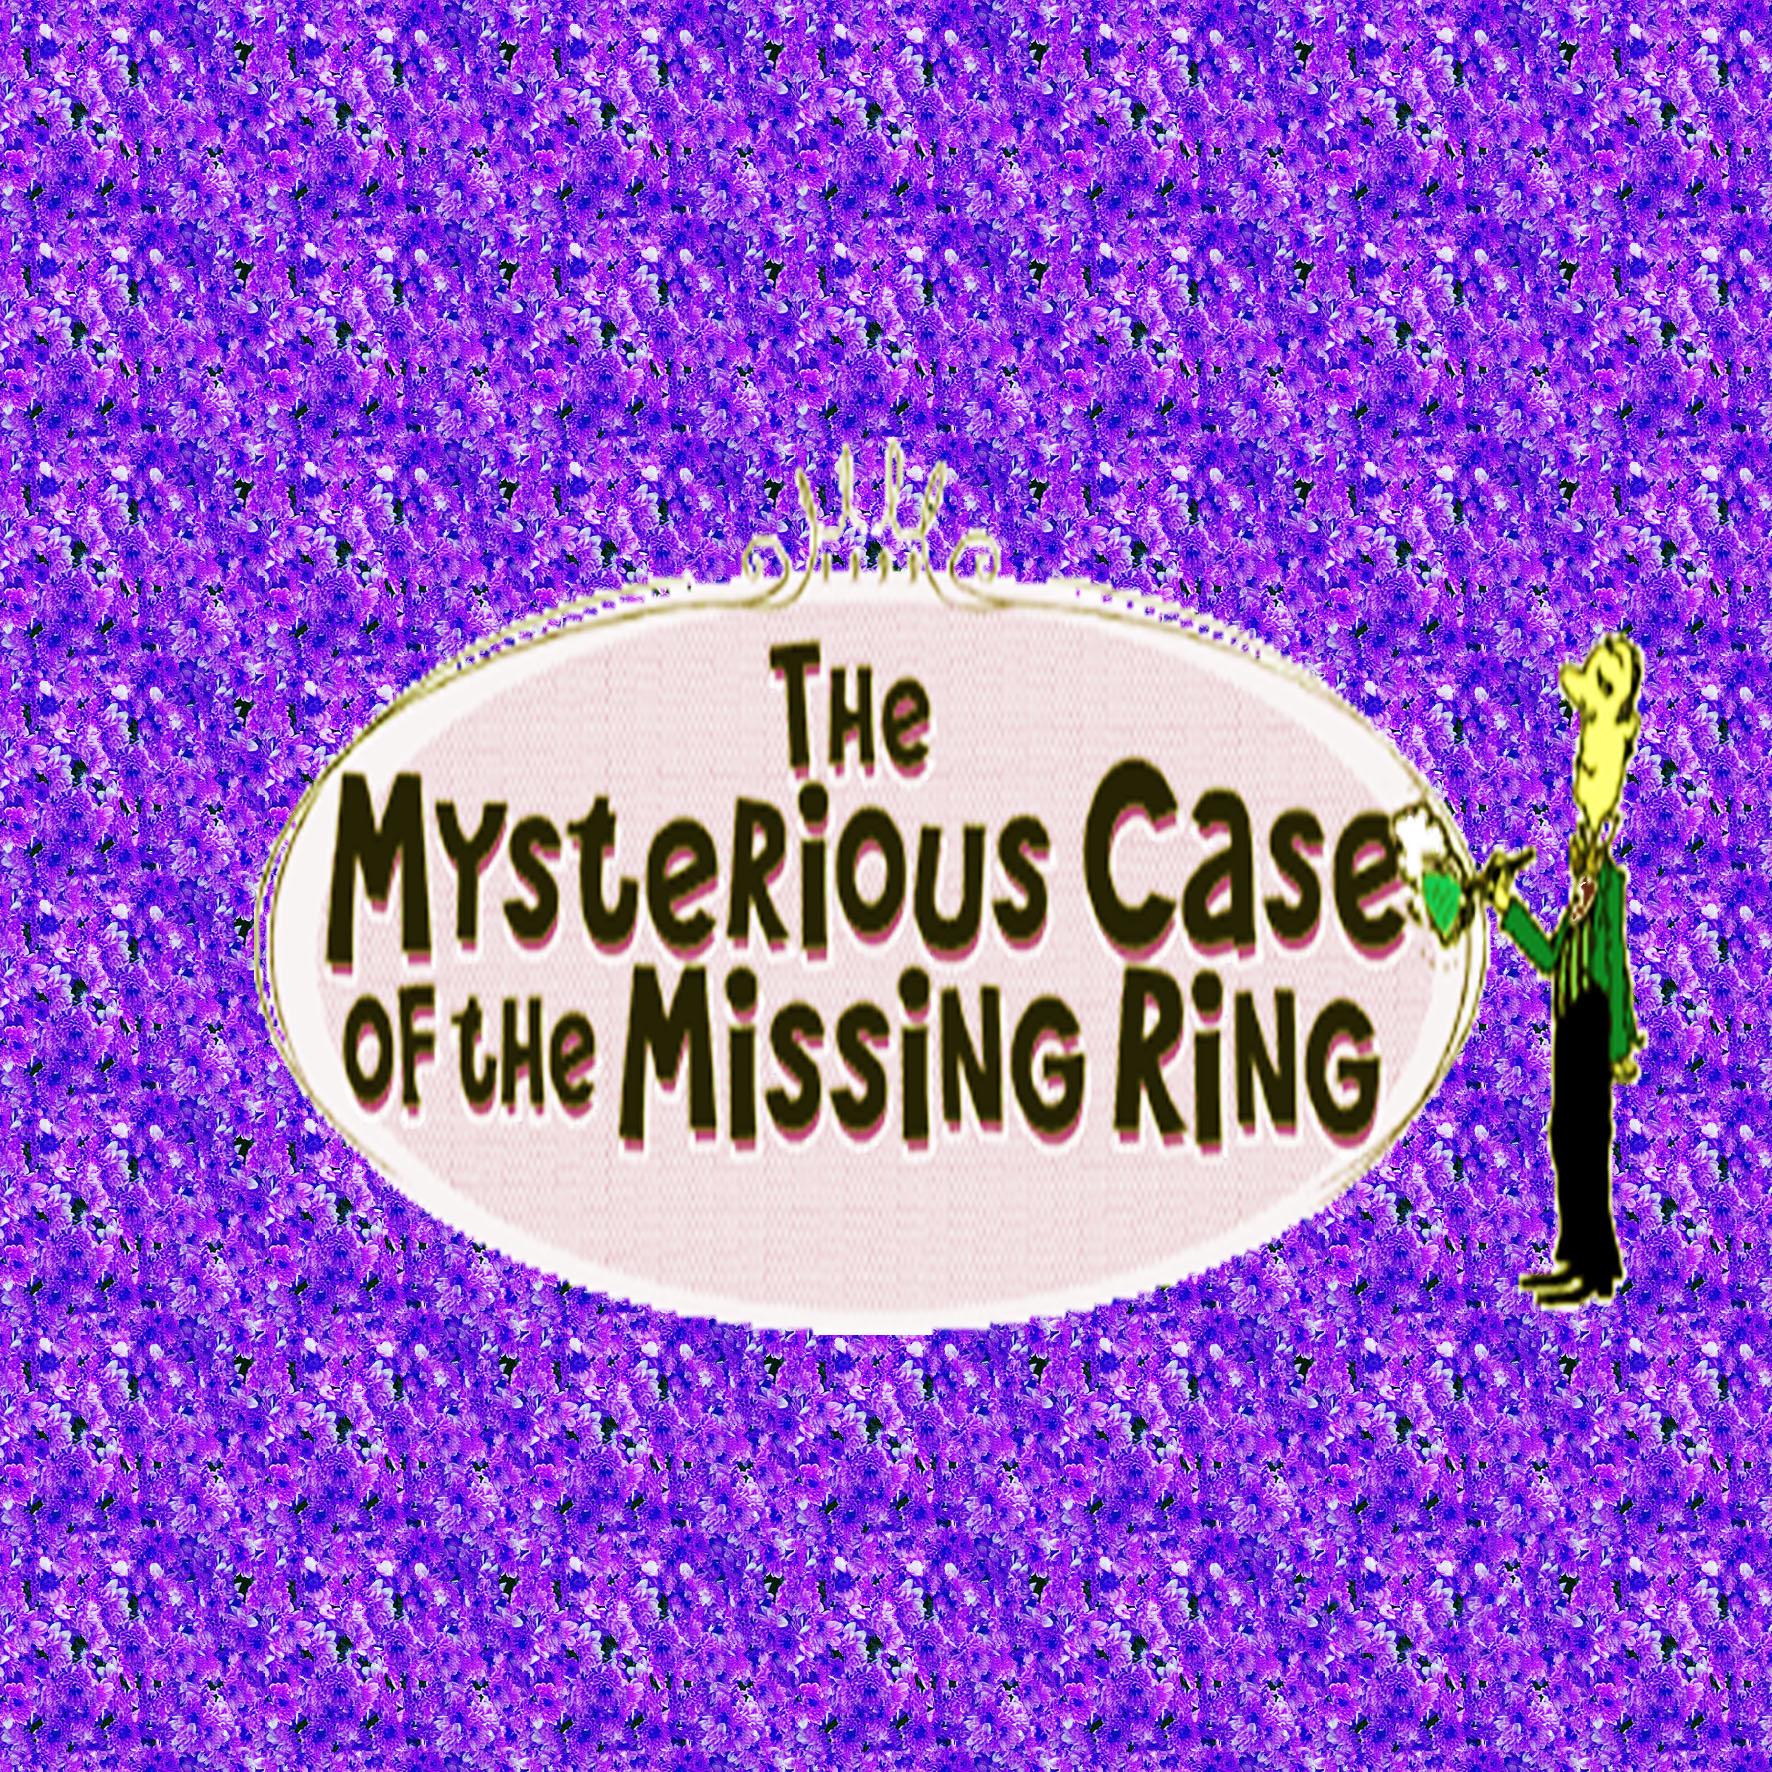 Mysterious Case purple 2.jpg